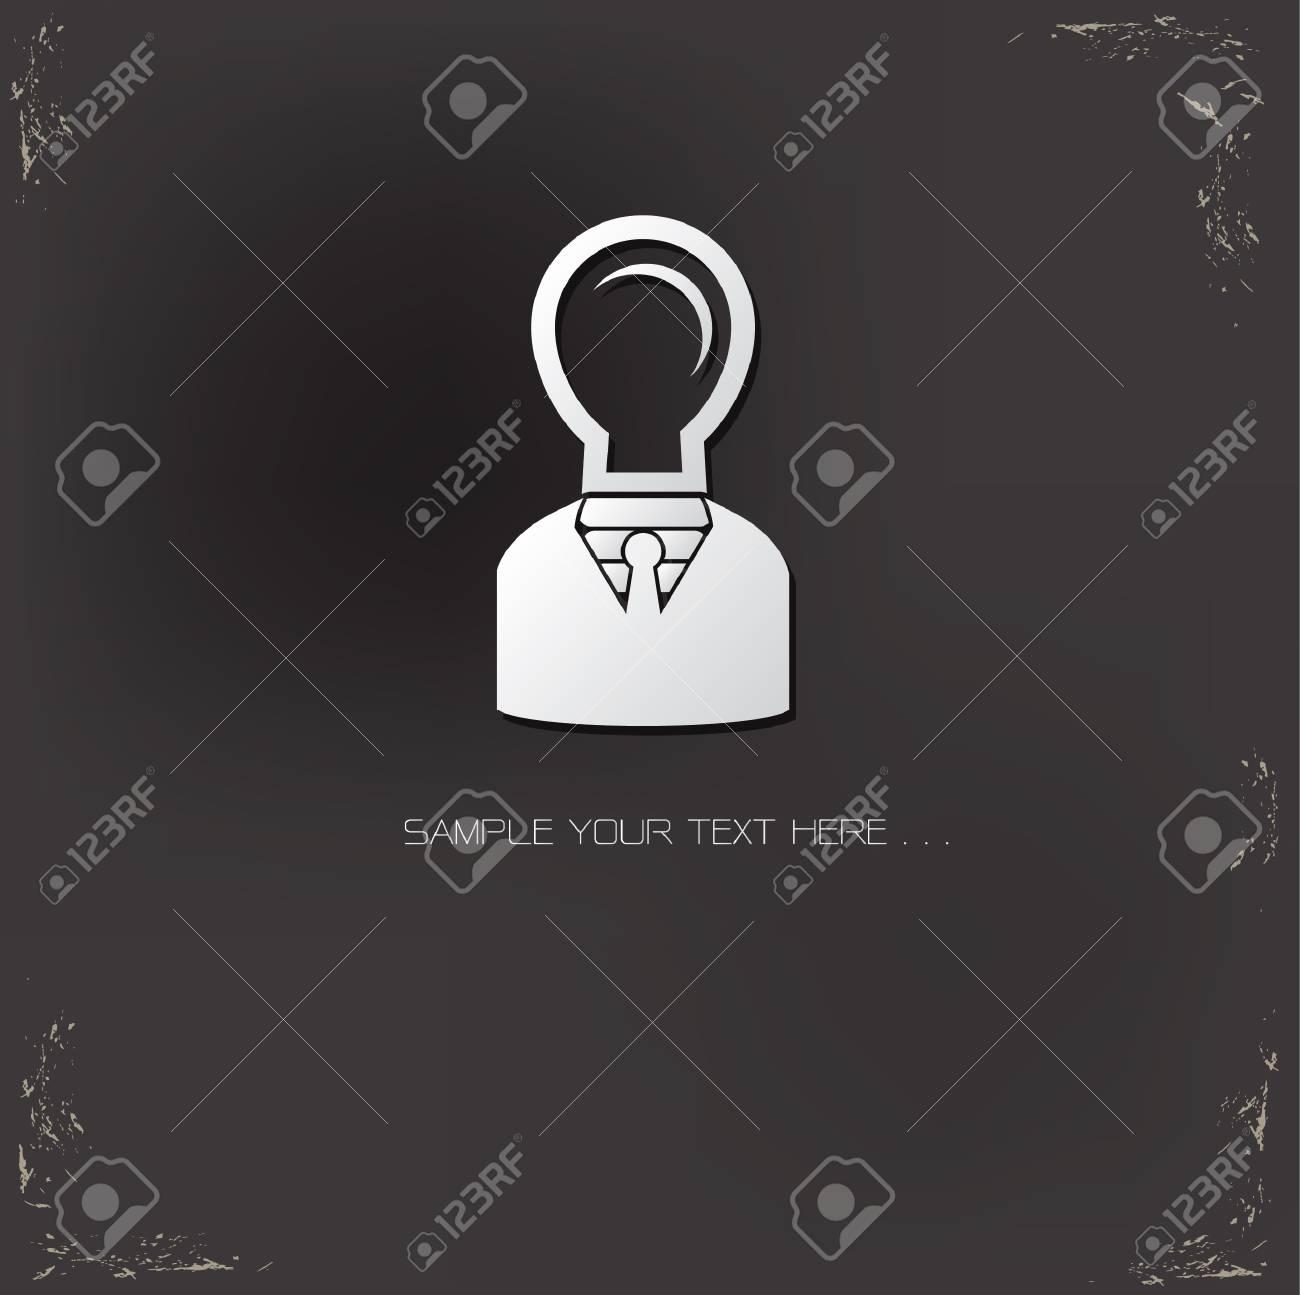 Light bulb man symbol on grunge background Stock Vector - 20761747